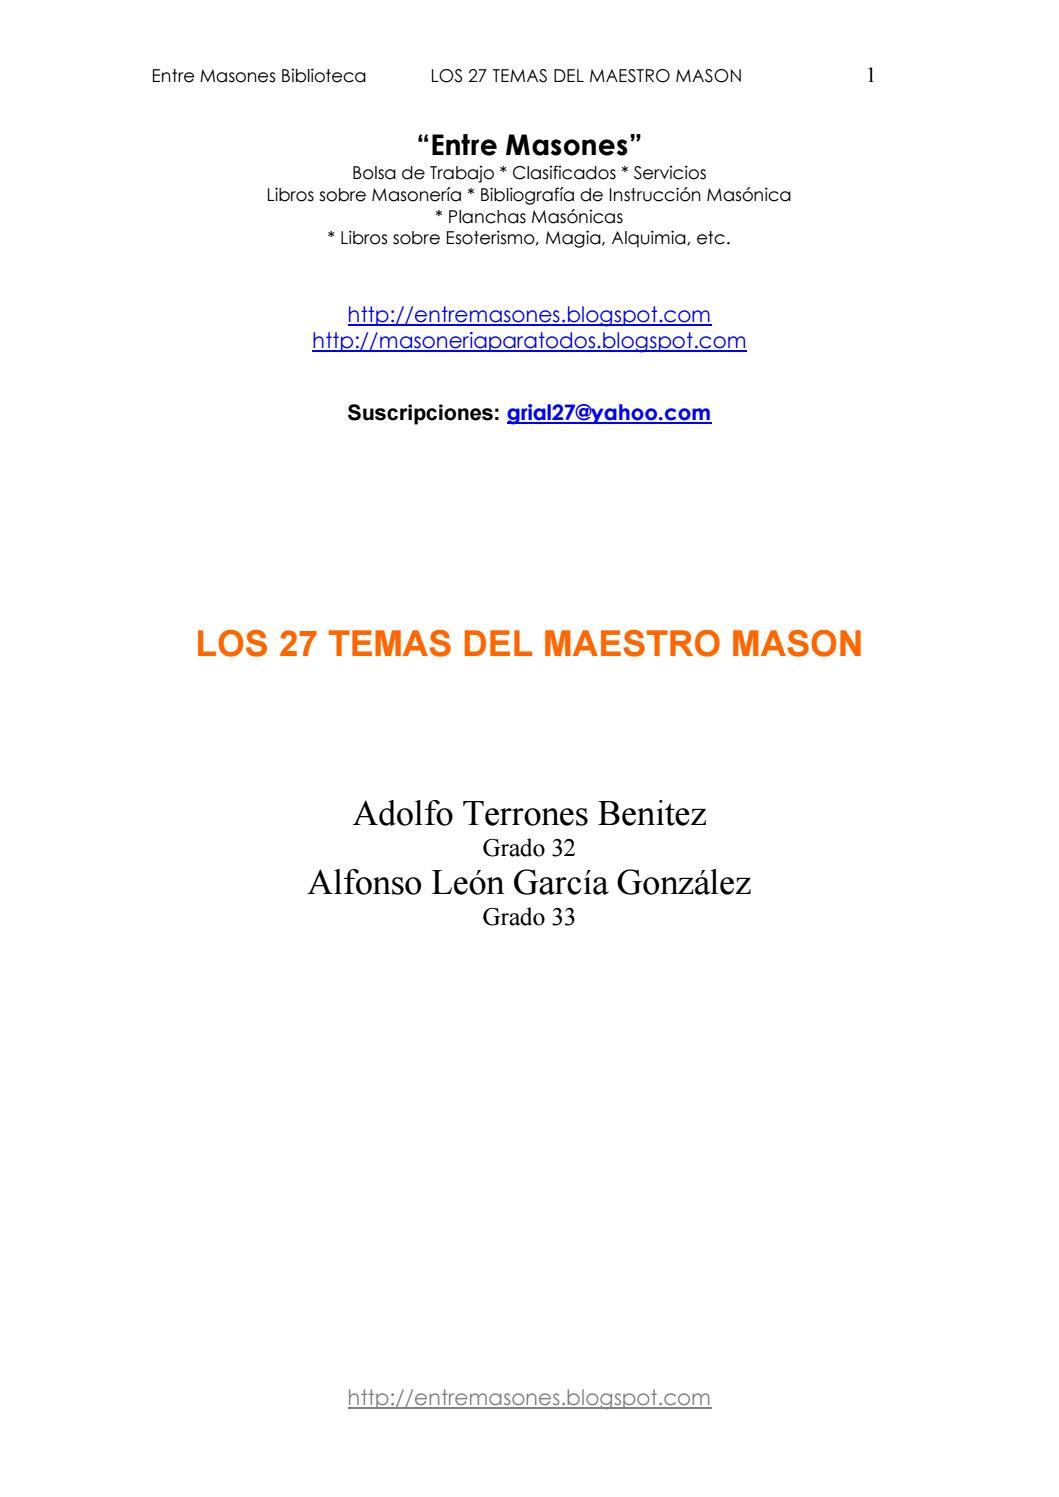 03. Los 27 Temas Del Maestro Masón by frater aureus - issuu